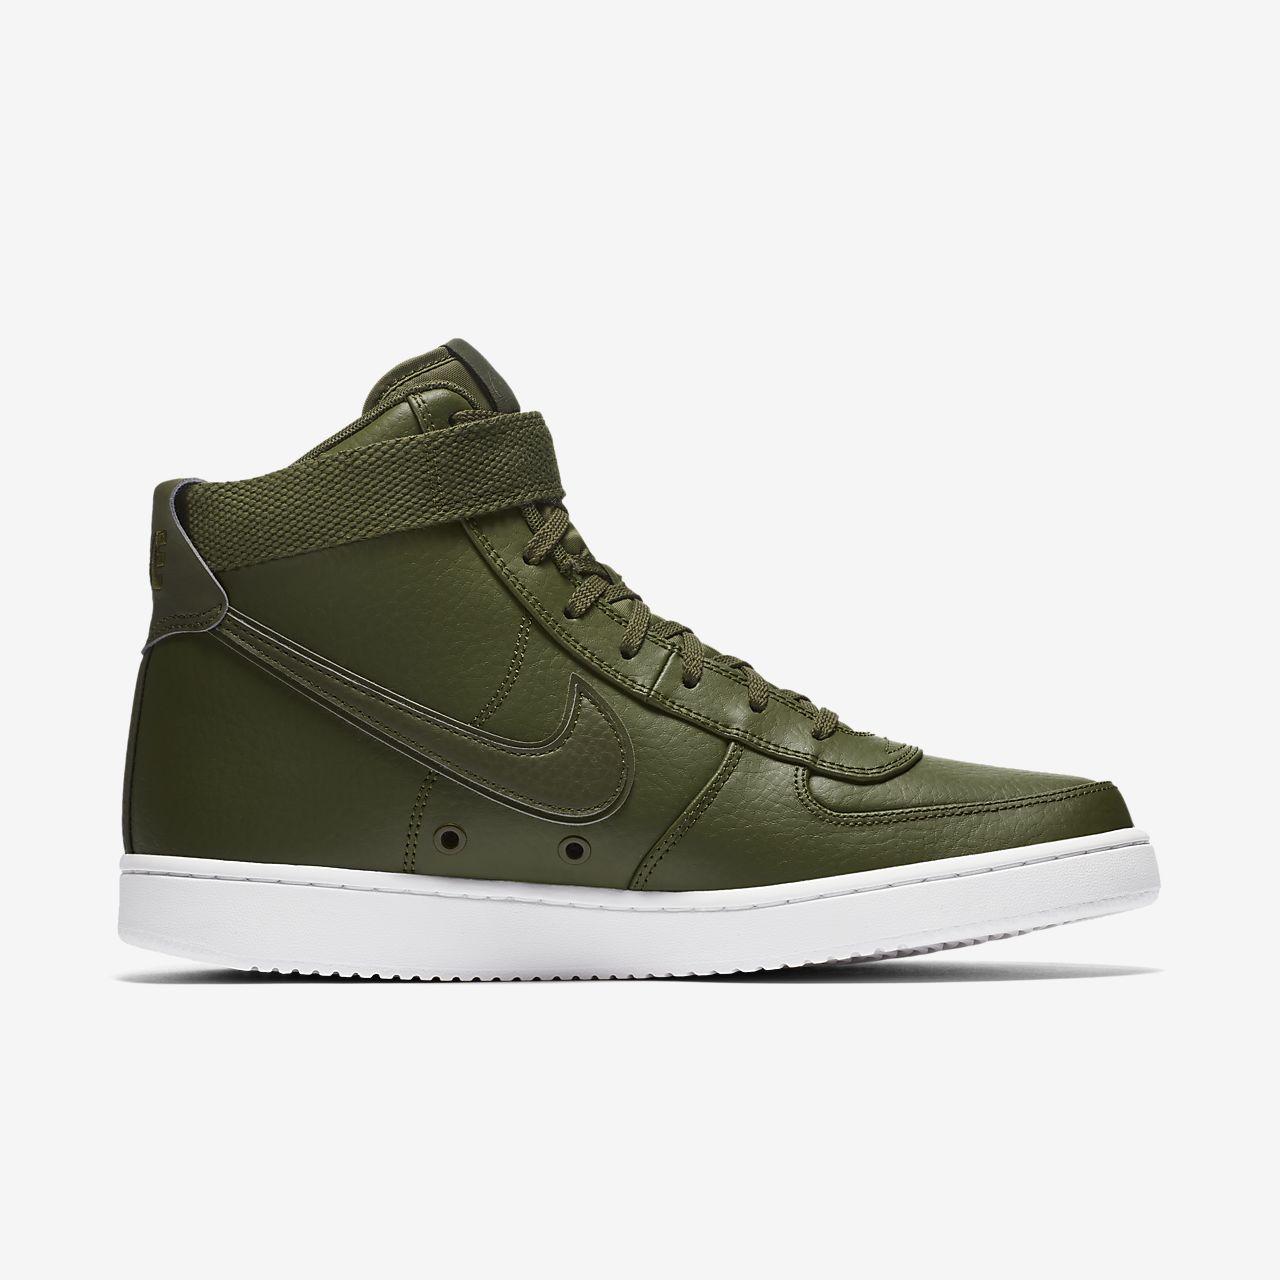 nike air force 1 mid legion green release date nz